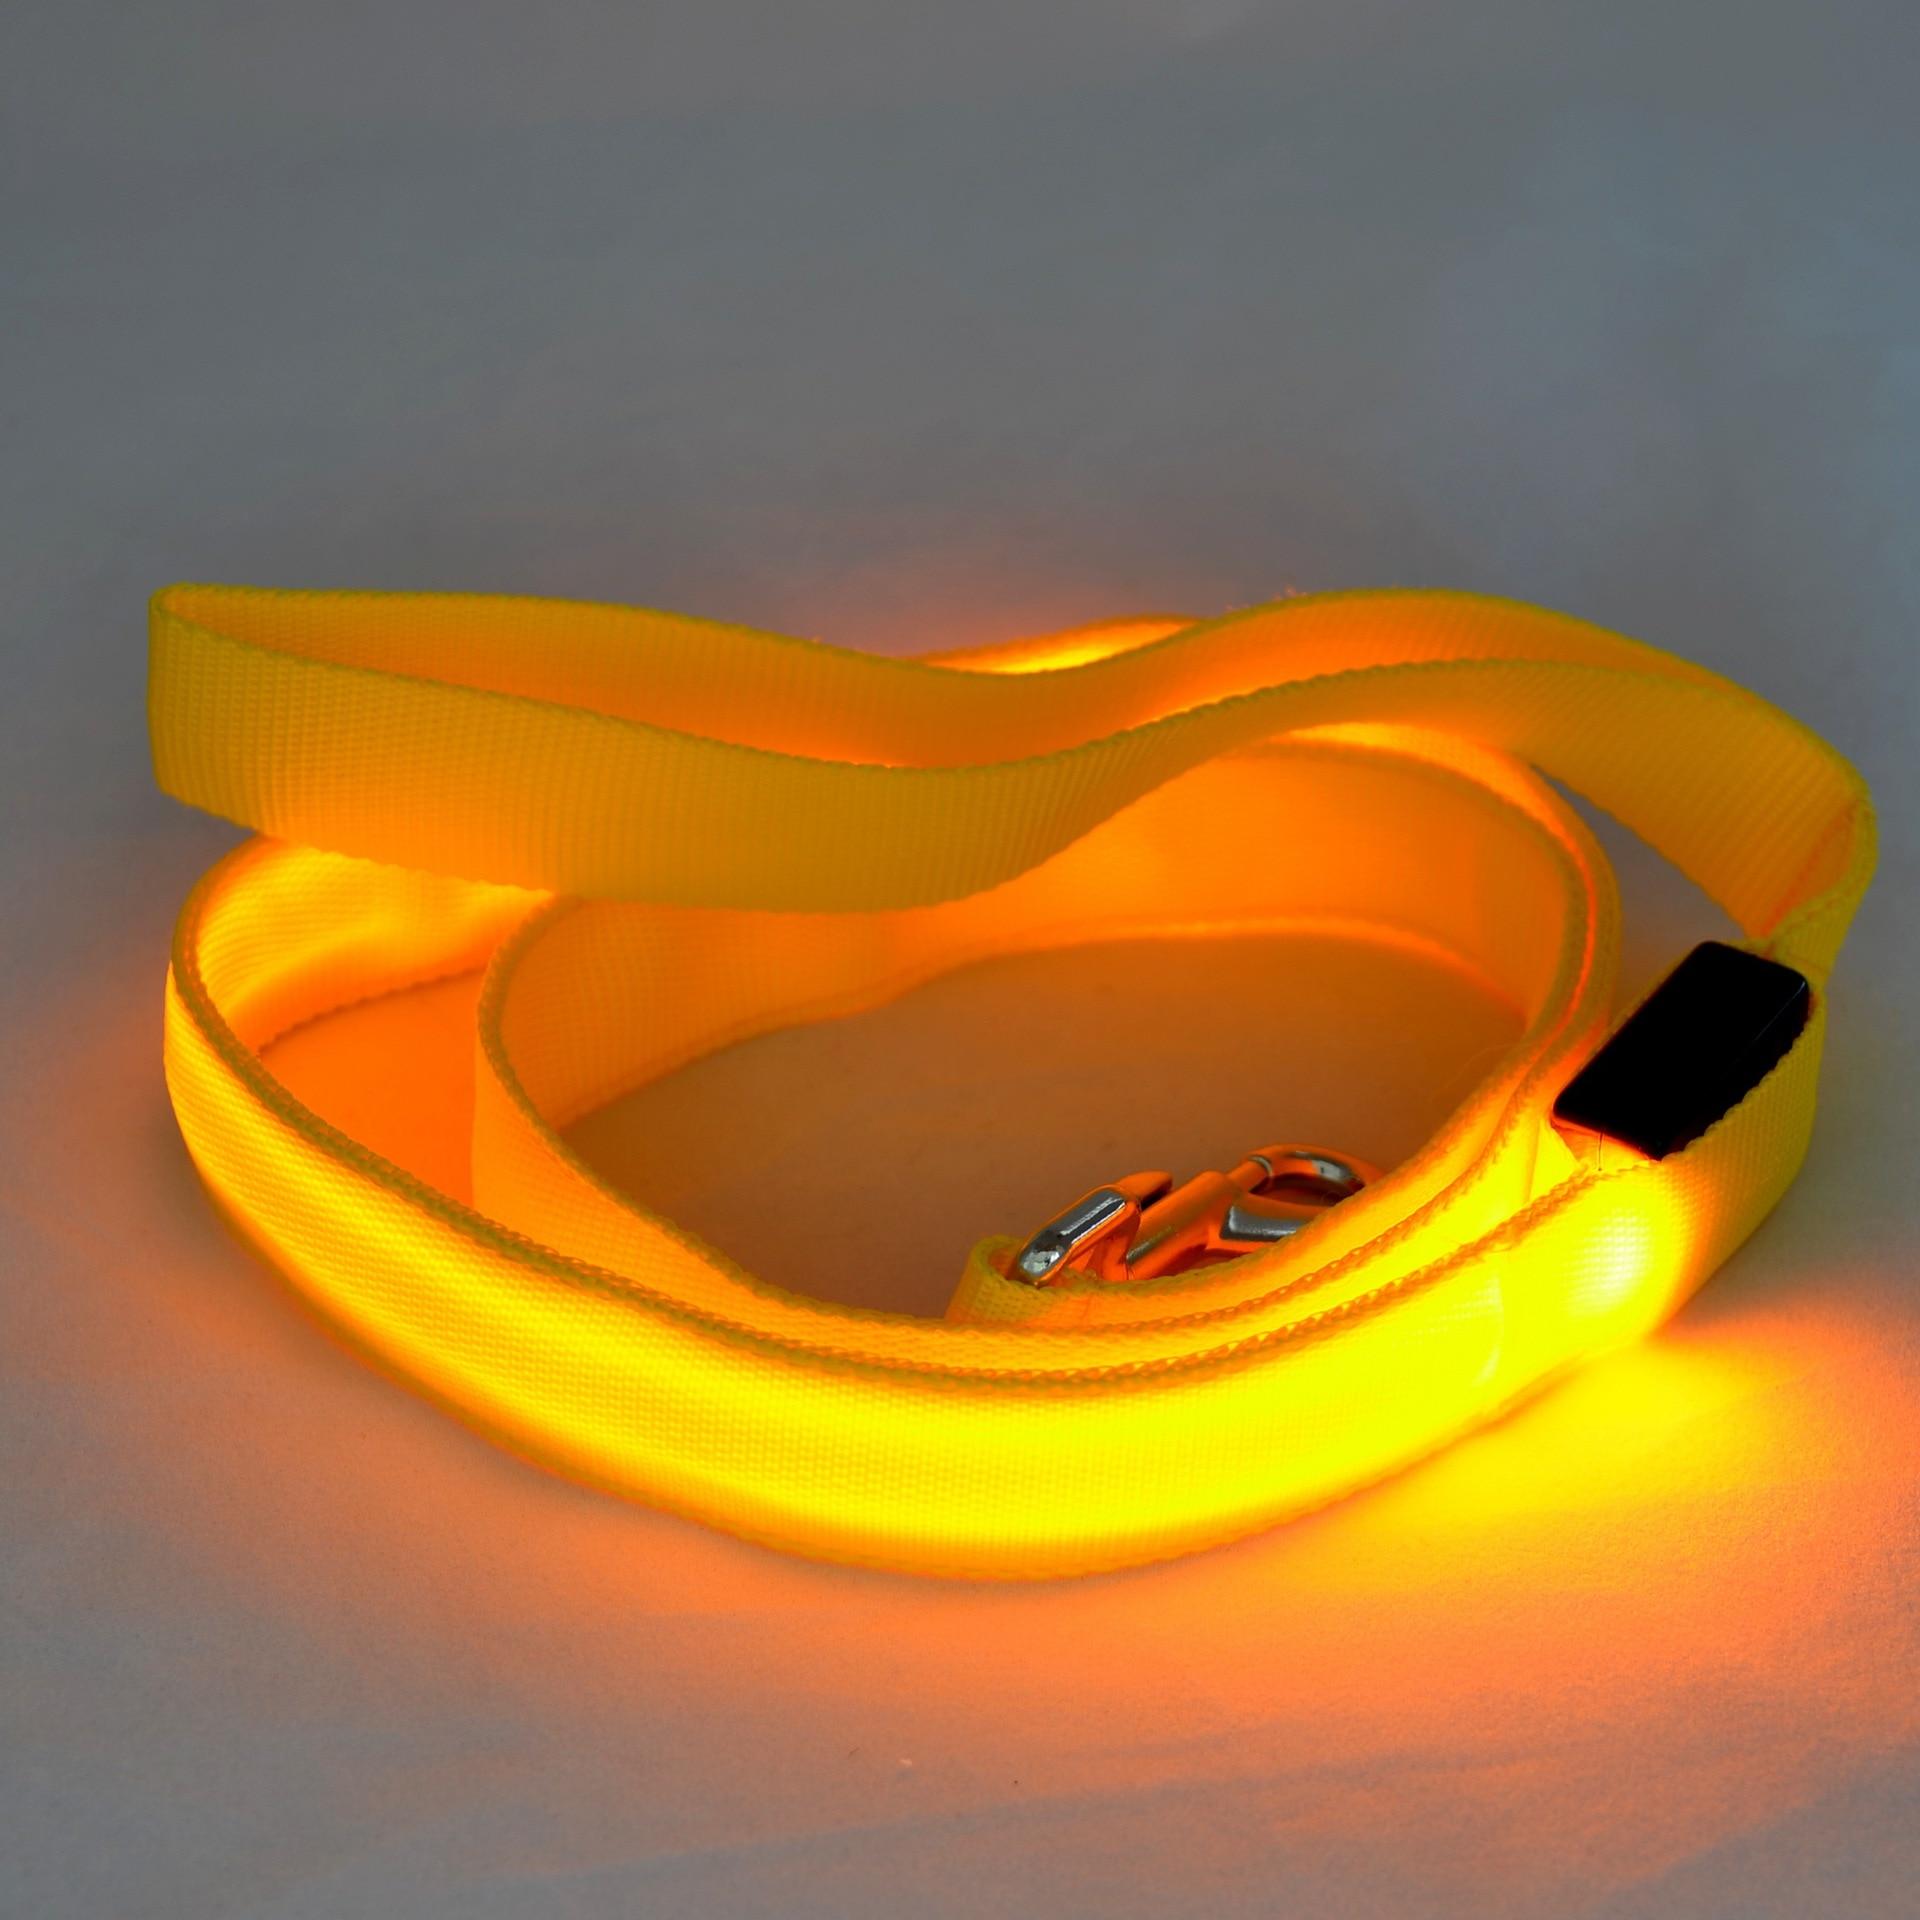 120cm Nylon Pet LED Dog Leash Night Safety LED Flashing Glow LED Pet Supplies Dogs Drawing Small Leads for LED Dog Collar